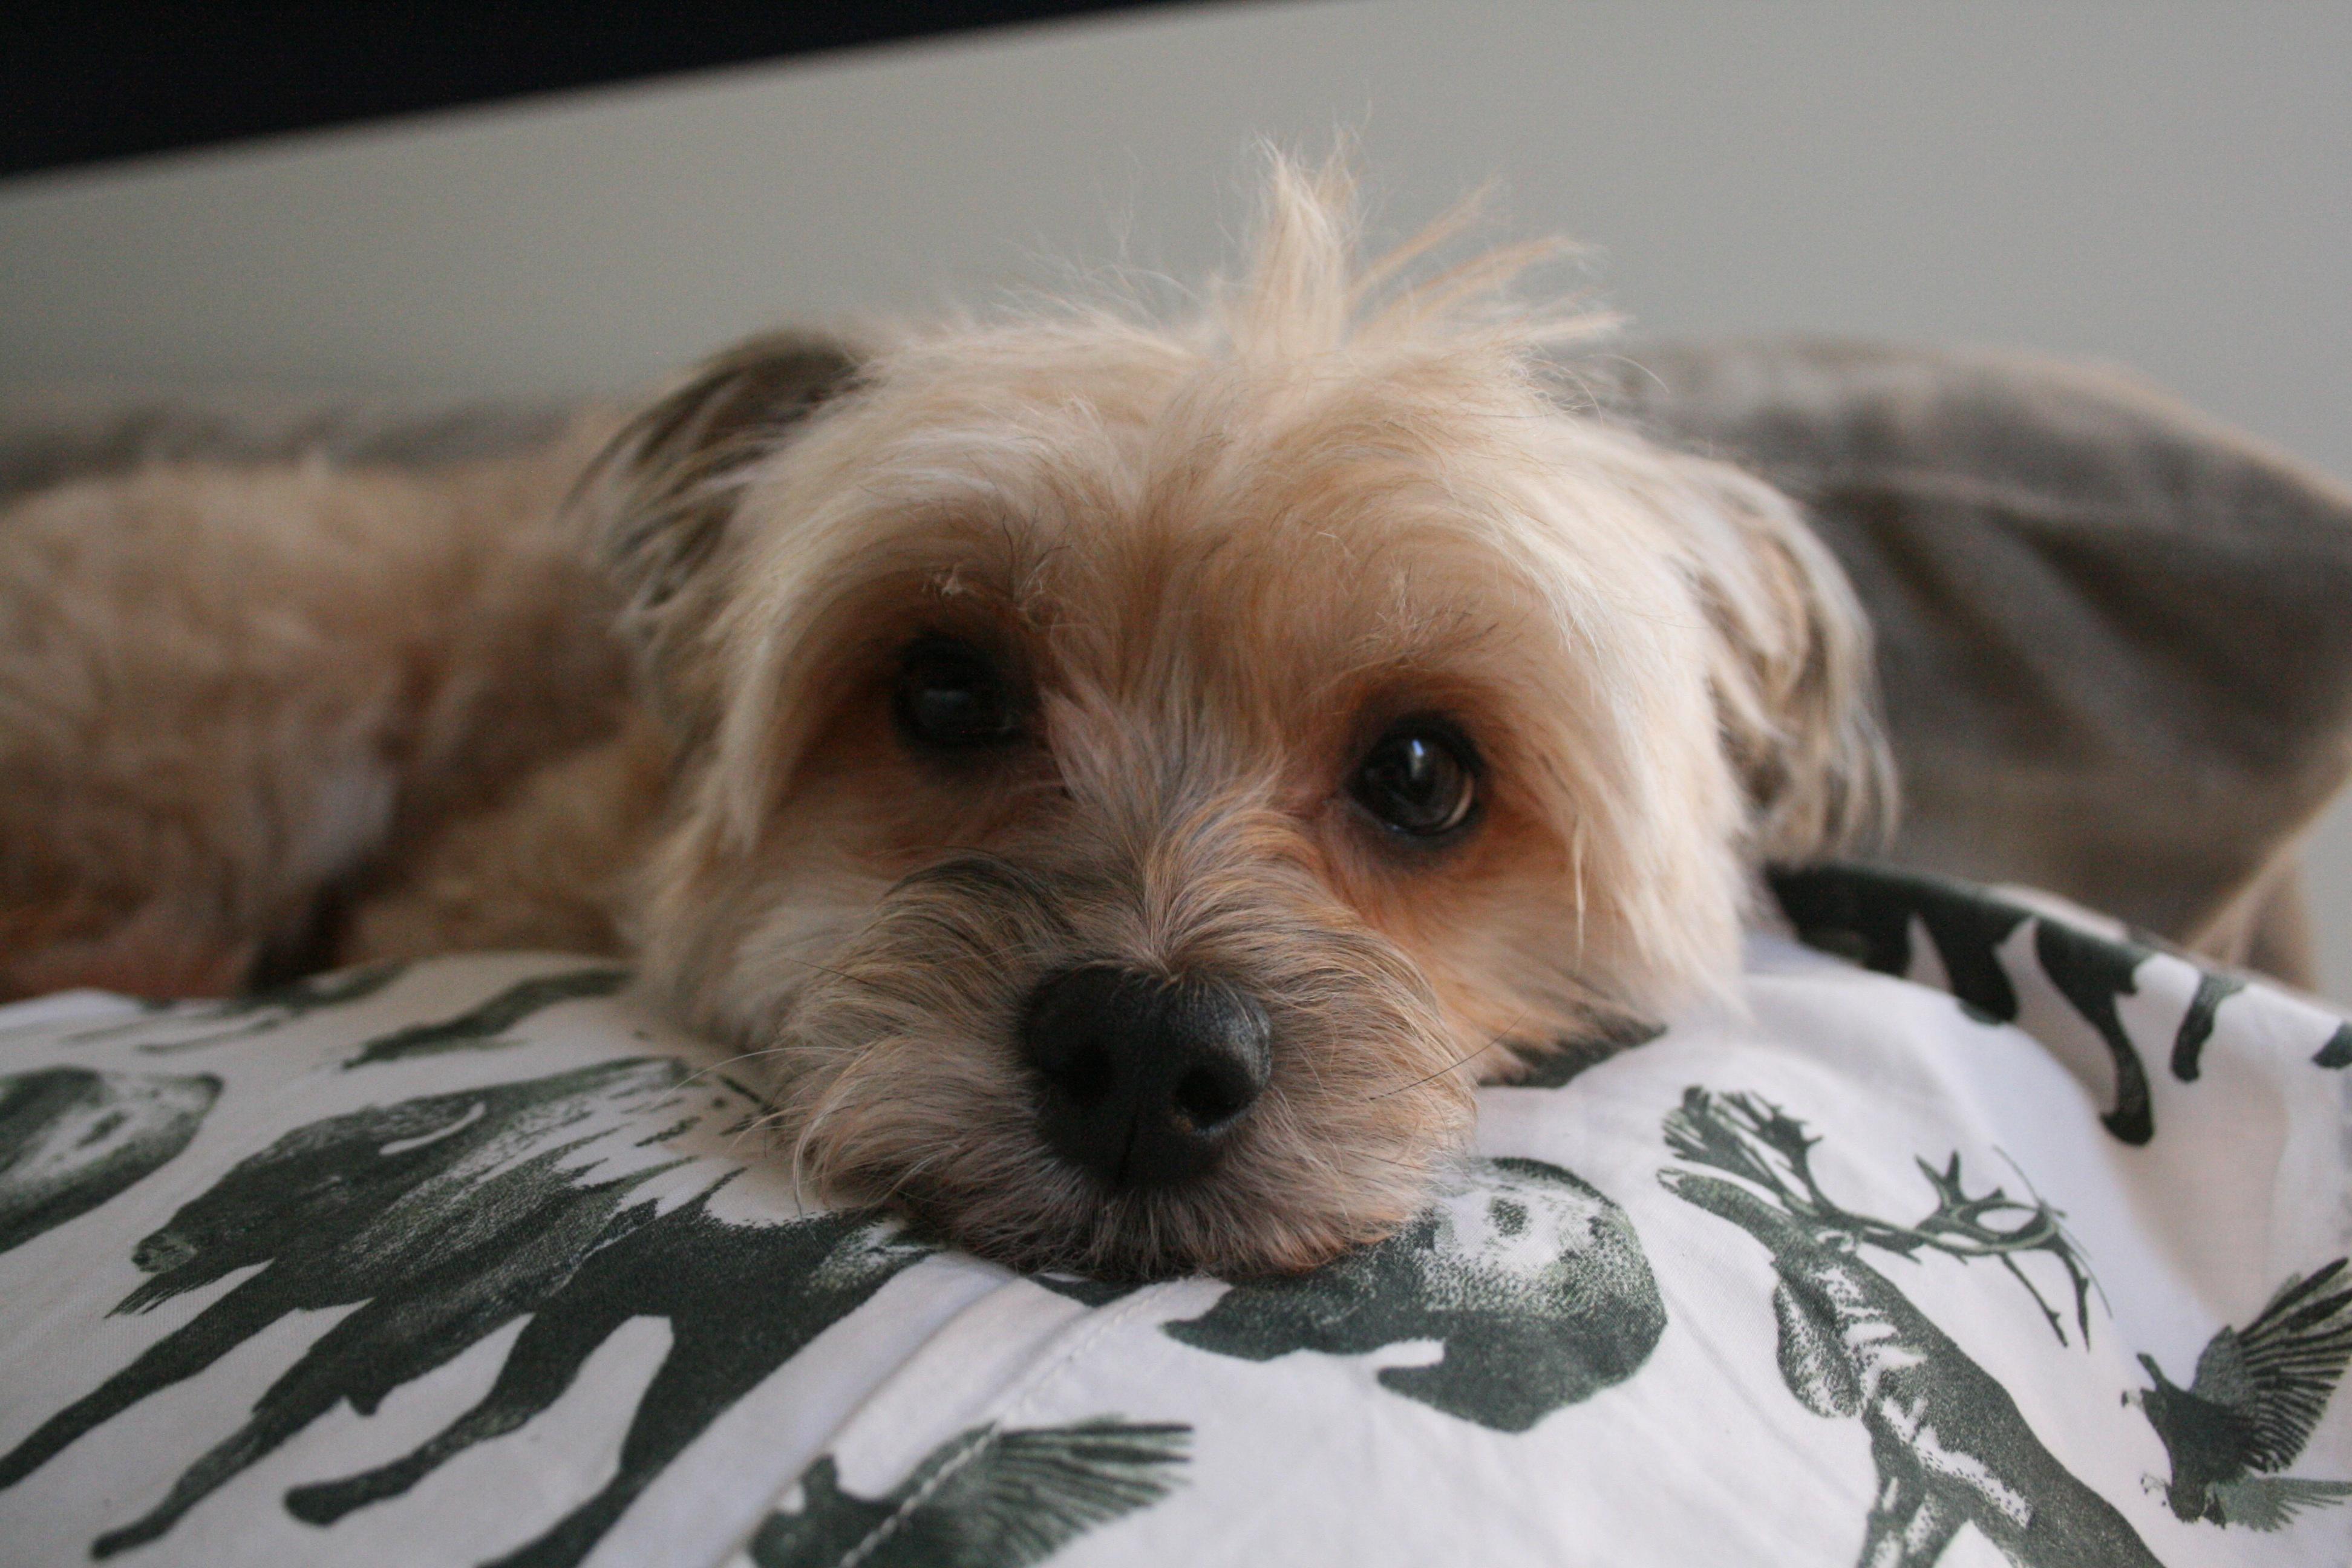 Free Images : puppy, vertebrate, dog breed, lhasa apso, yorkshire